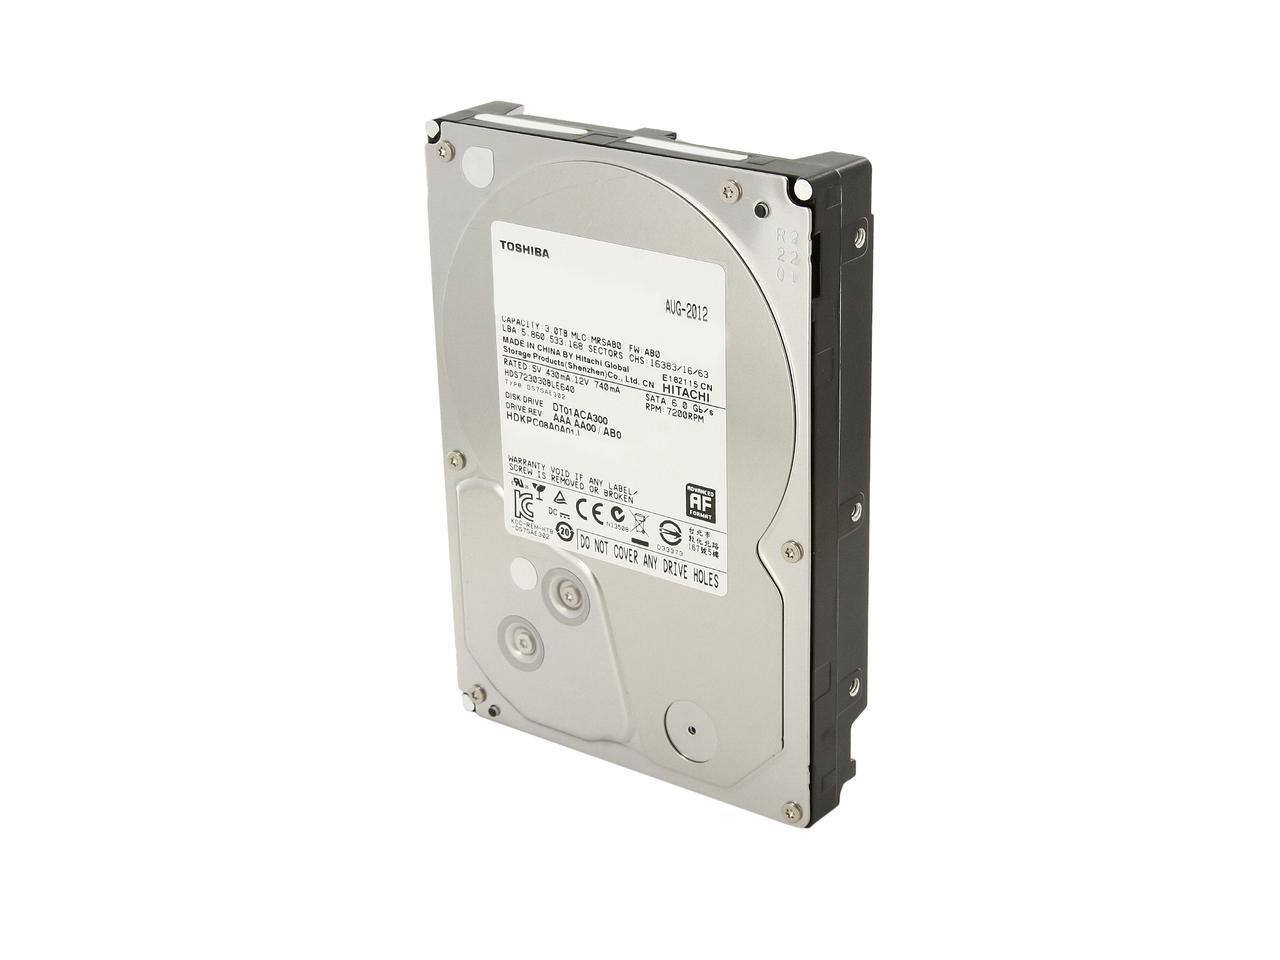 "3 TB Toshiba 3.5"" SATA III 7200 RPM Internal Bare Hard Drive (DT01ACA300) for $67.99 AC + Free Ship @ Newegg"